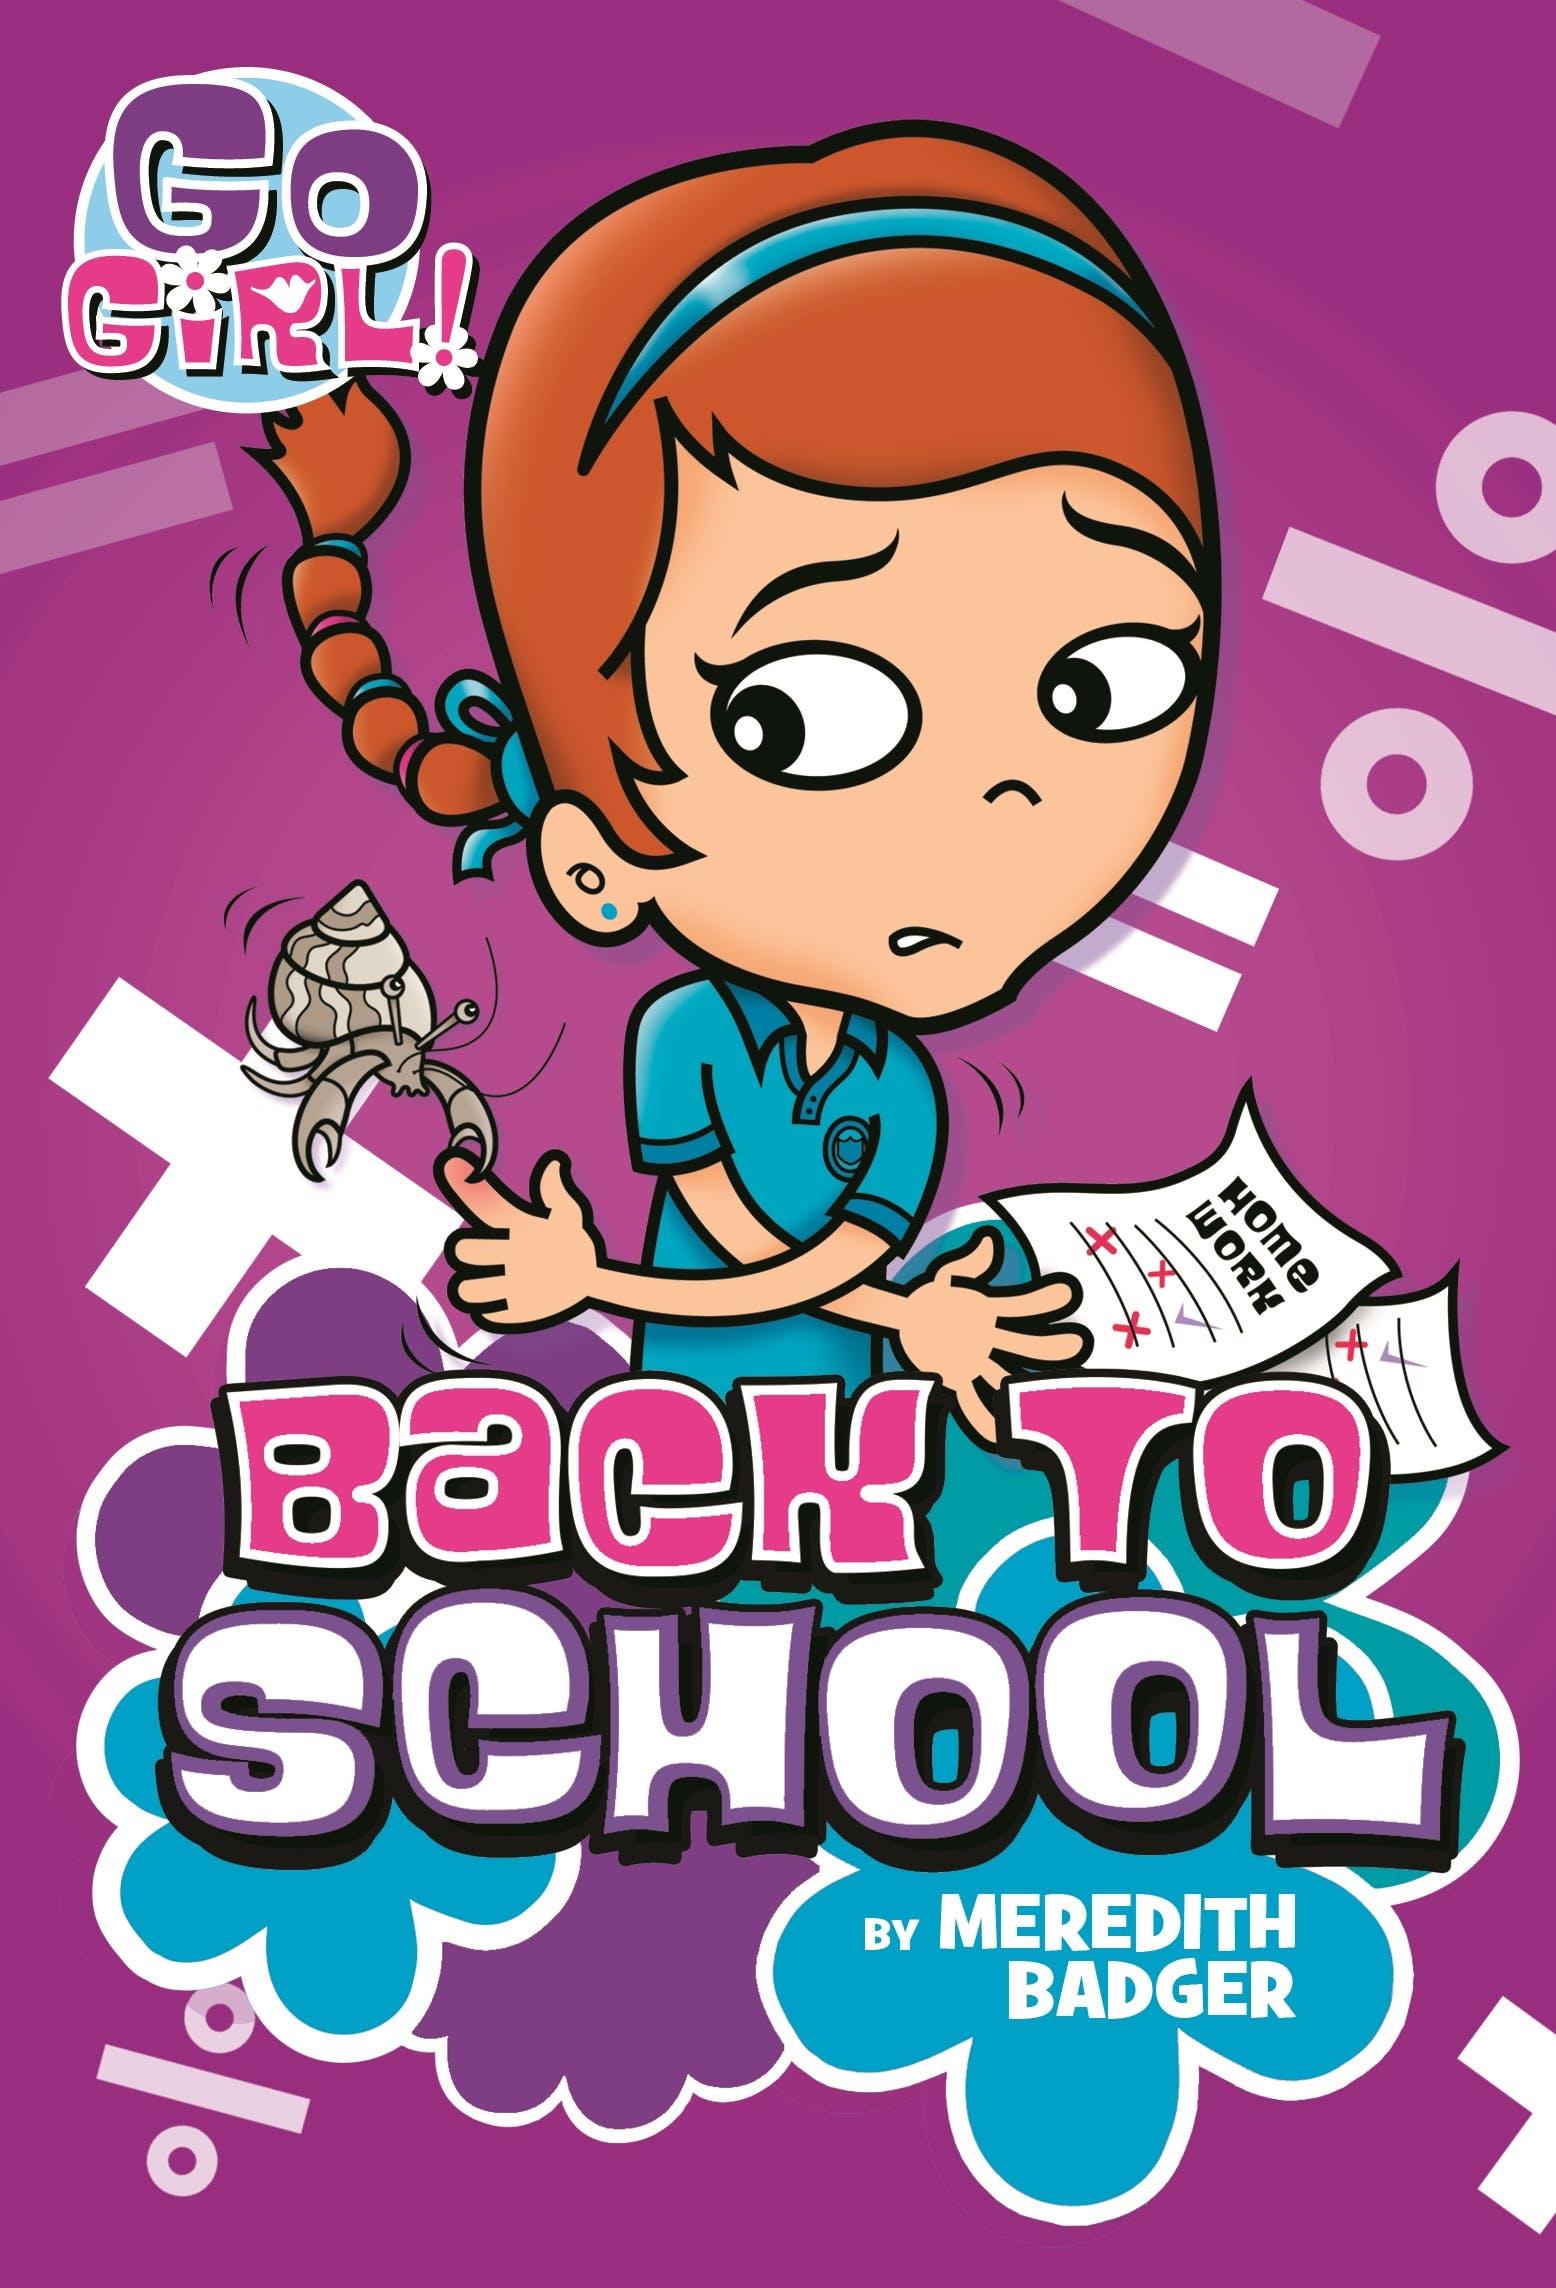 Image of Go Girl #10: Back to School